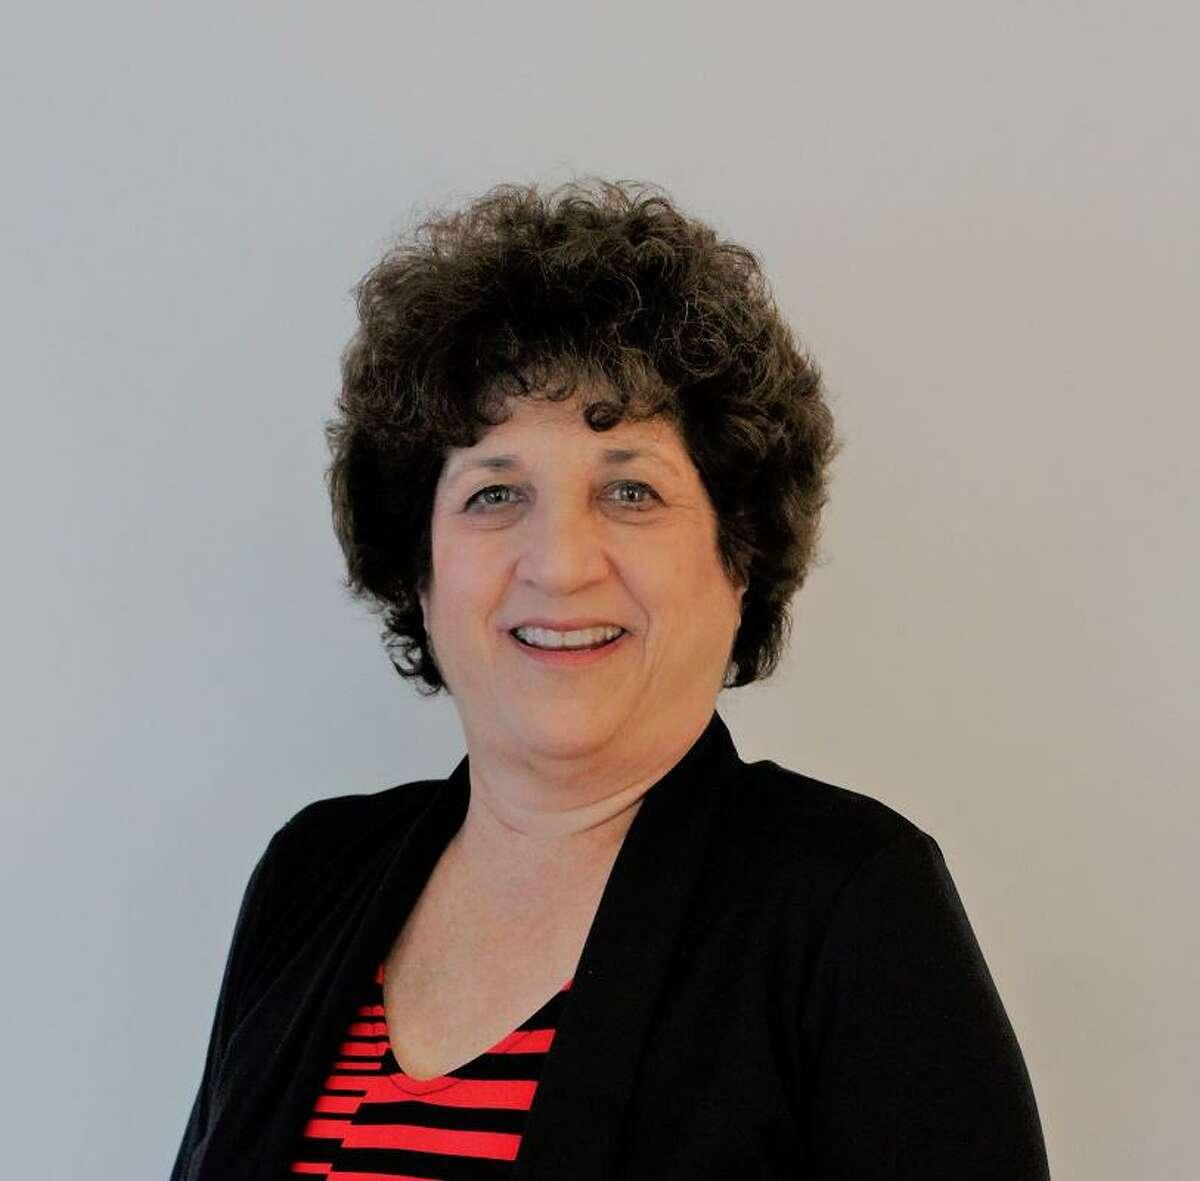 Republican candidate Michele Gregorio